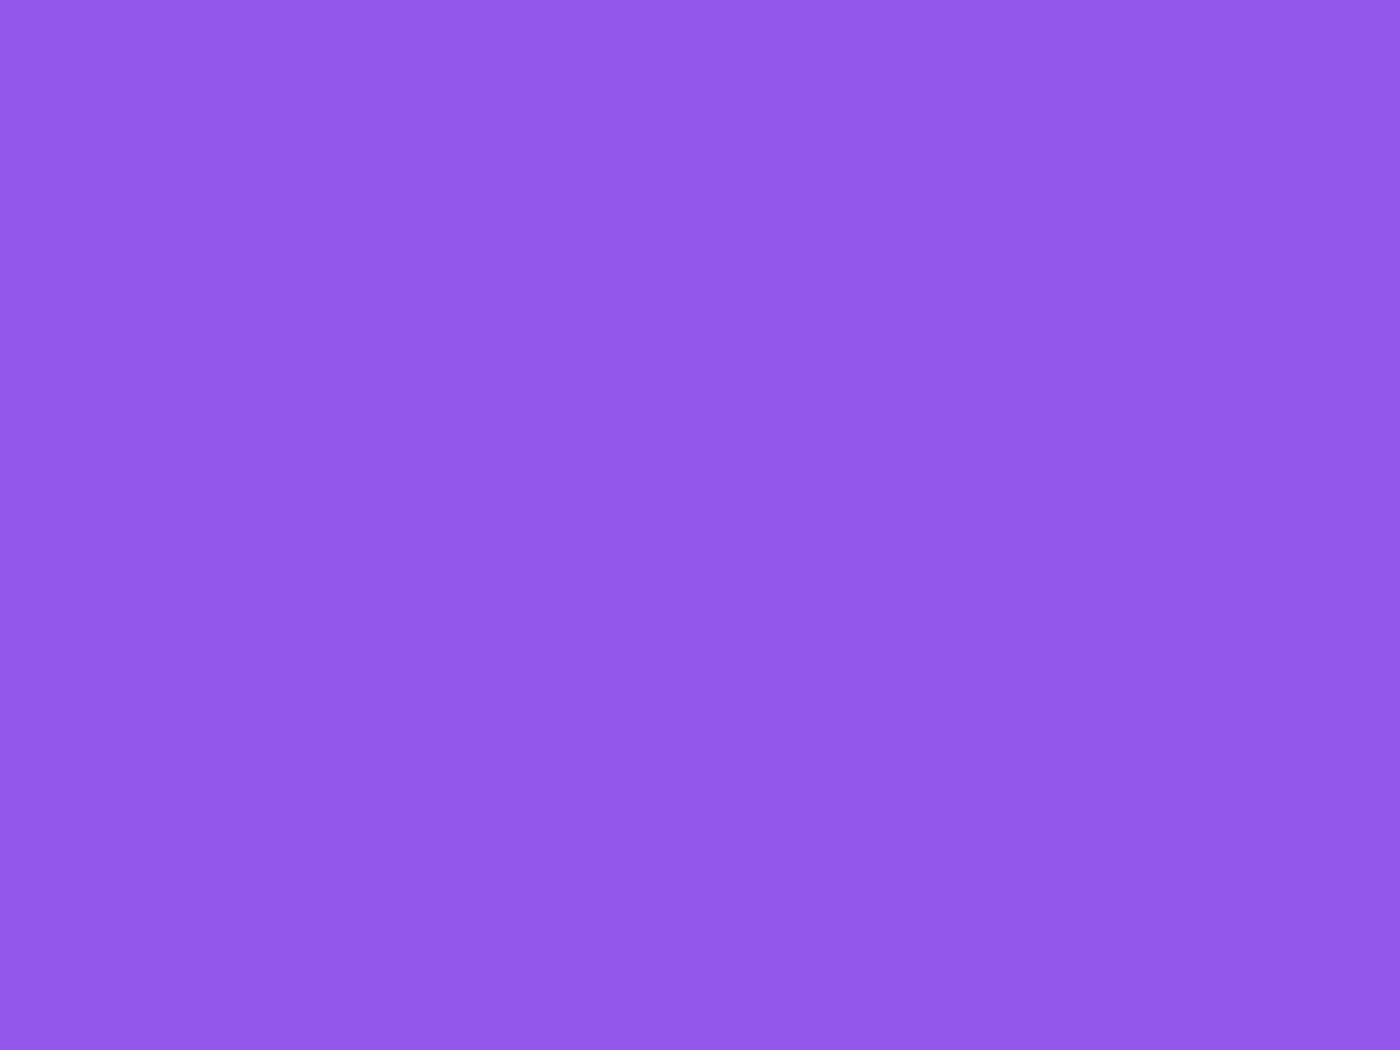 1400x1050 Lavender Indigo Solid Color Background